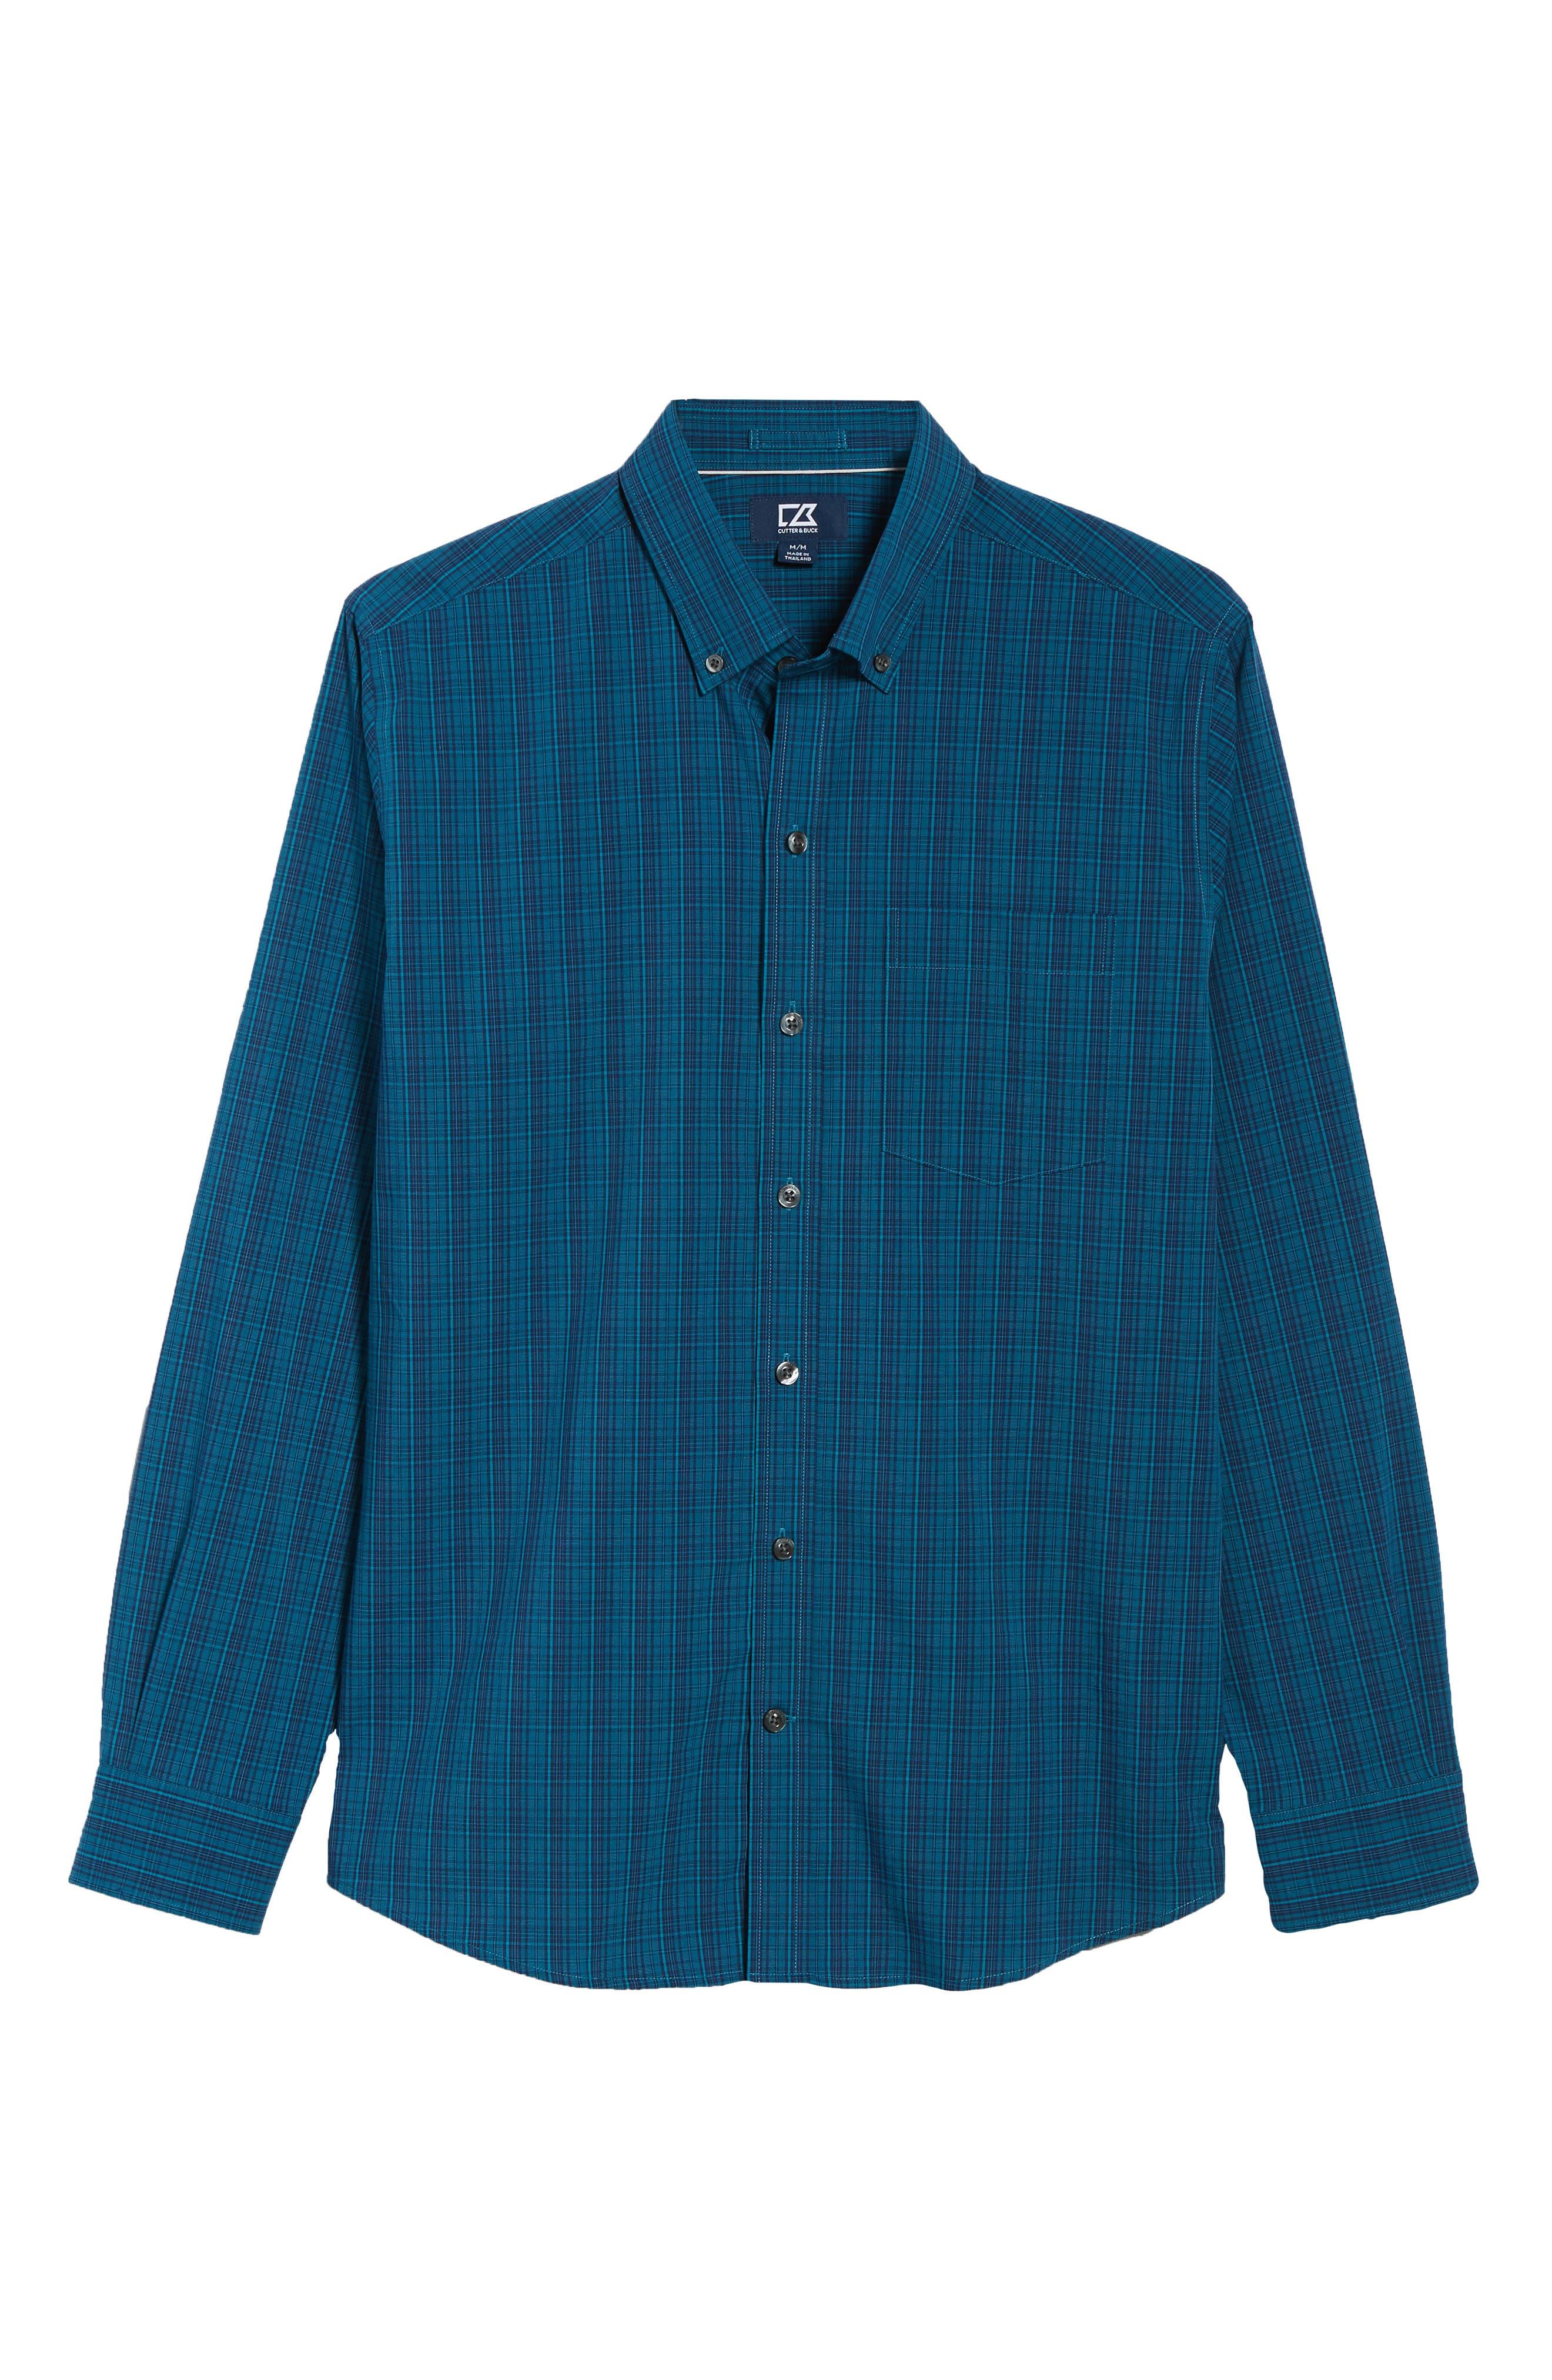 Logan Regular Fit Non-Iron Sport Shirt,                             Alternate thumbnail 5, color,                             400